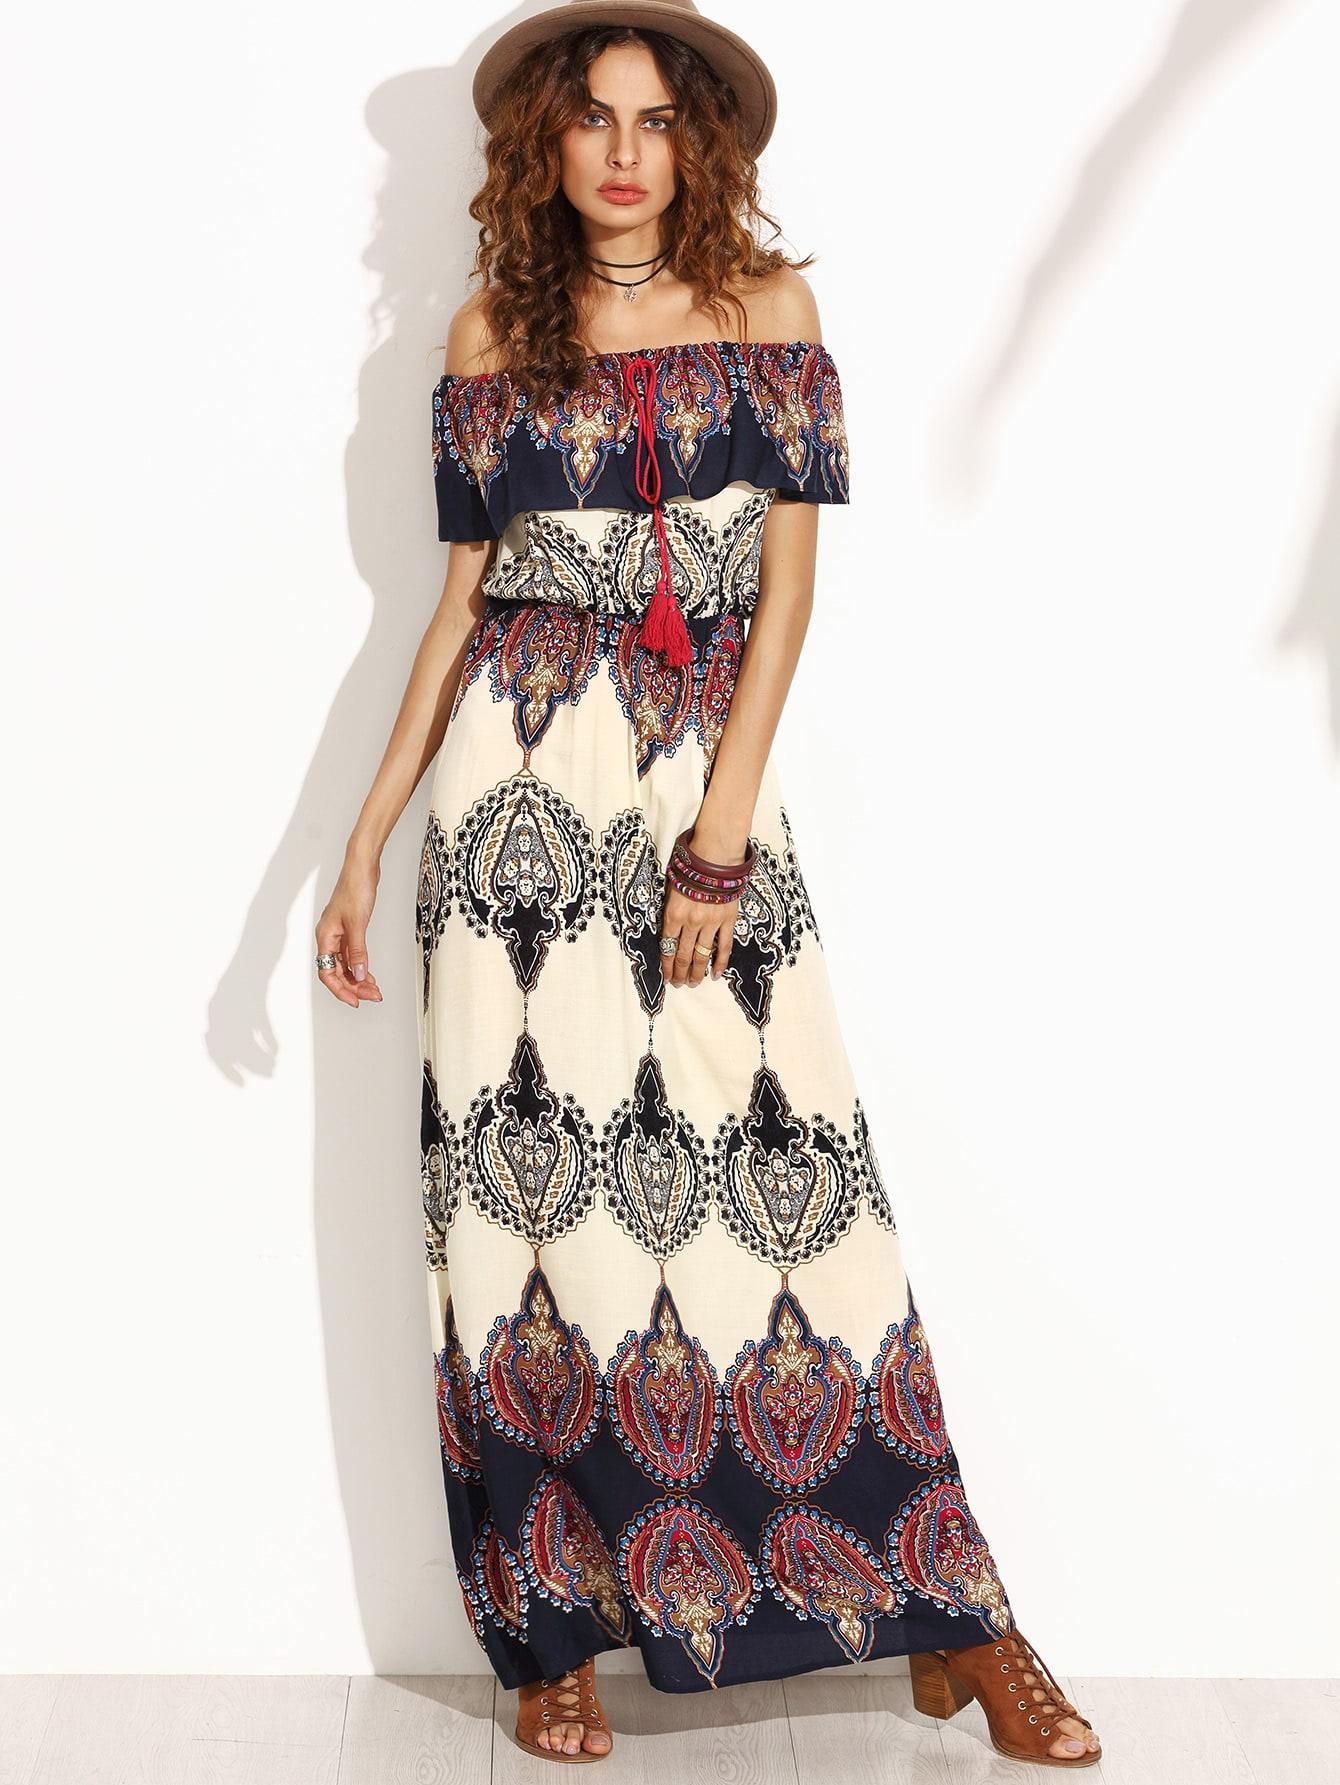 a18765435b KOZ1.com   Shop for latest women's fashion dresses, tops, bottoms.